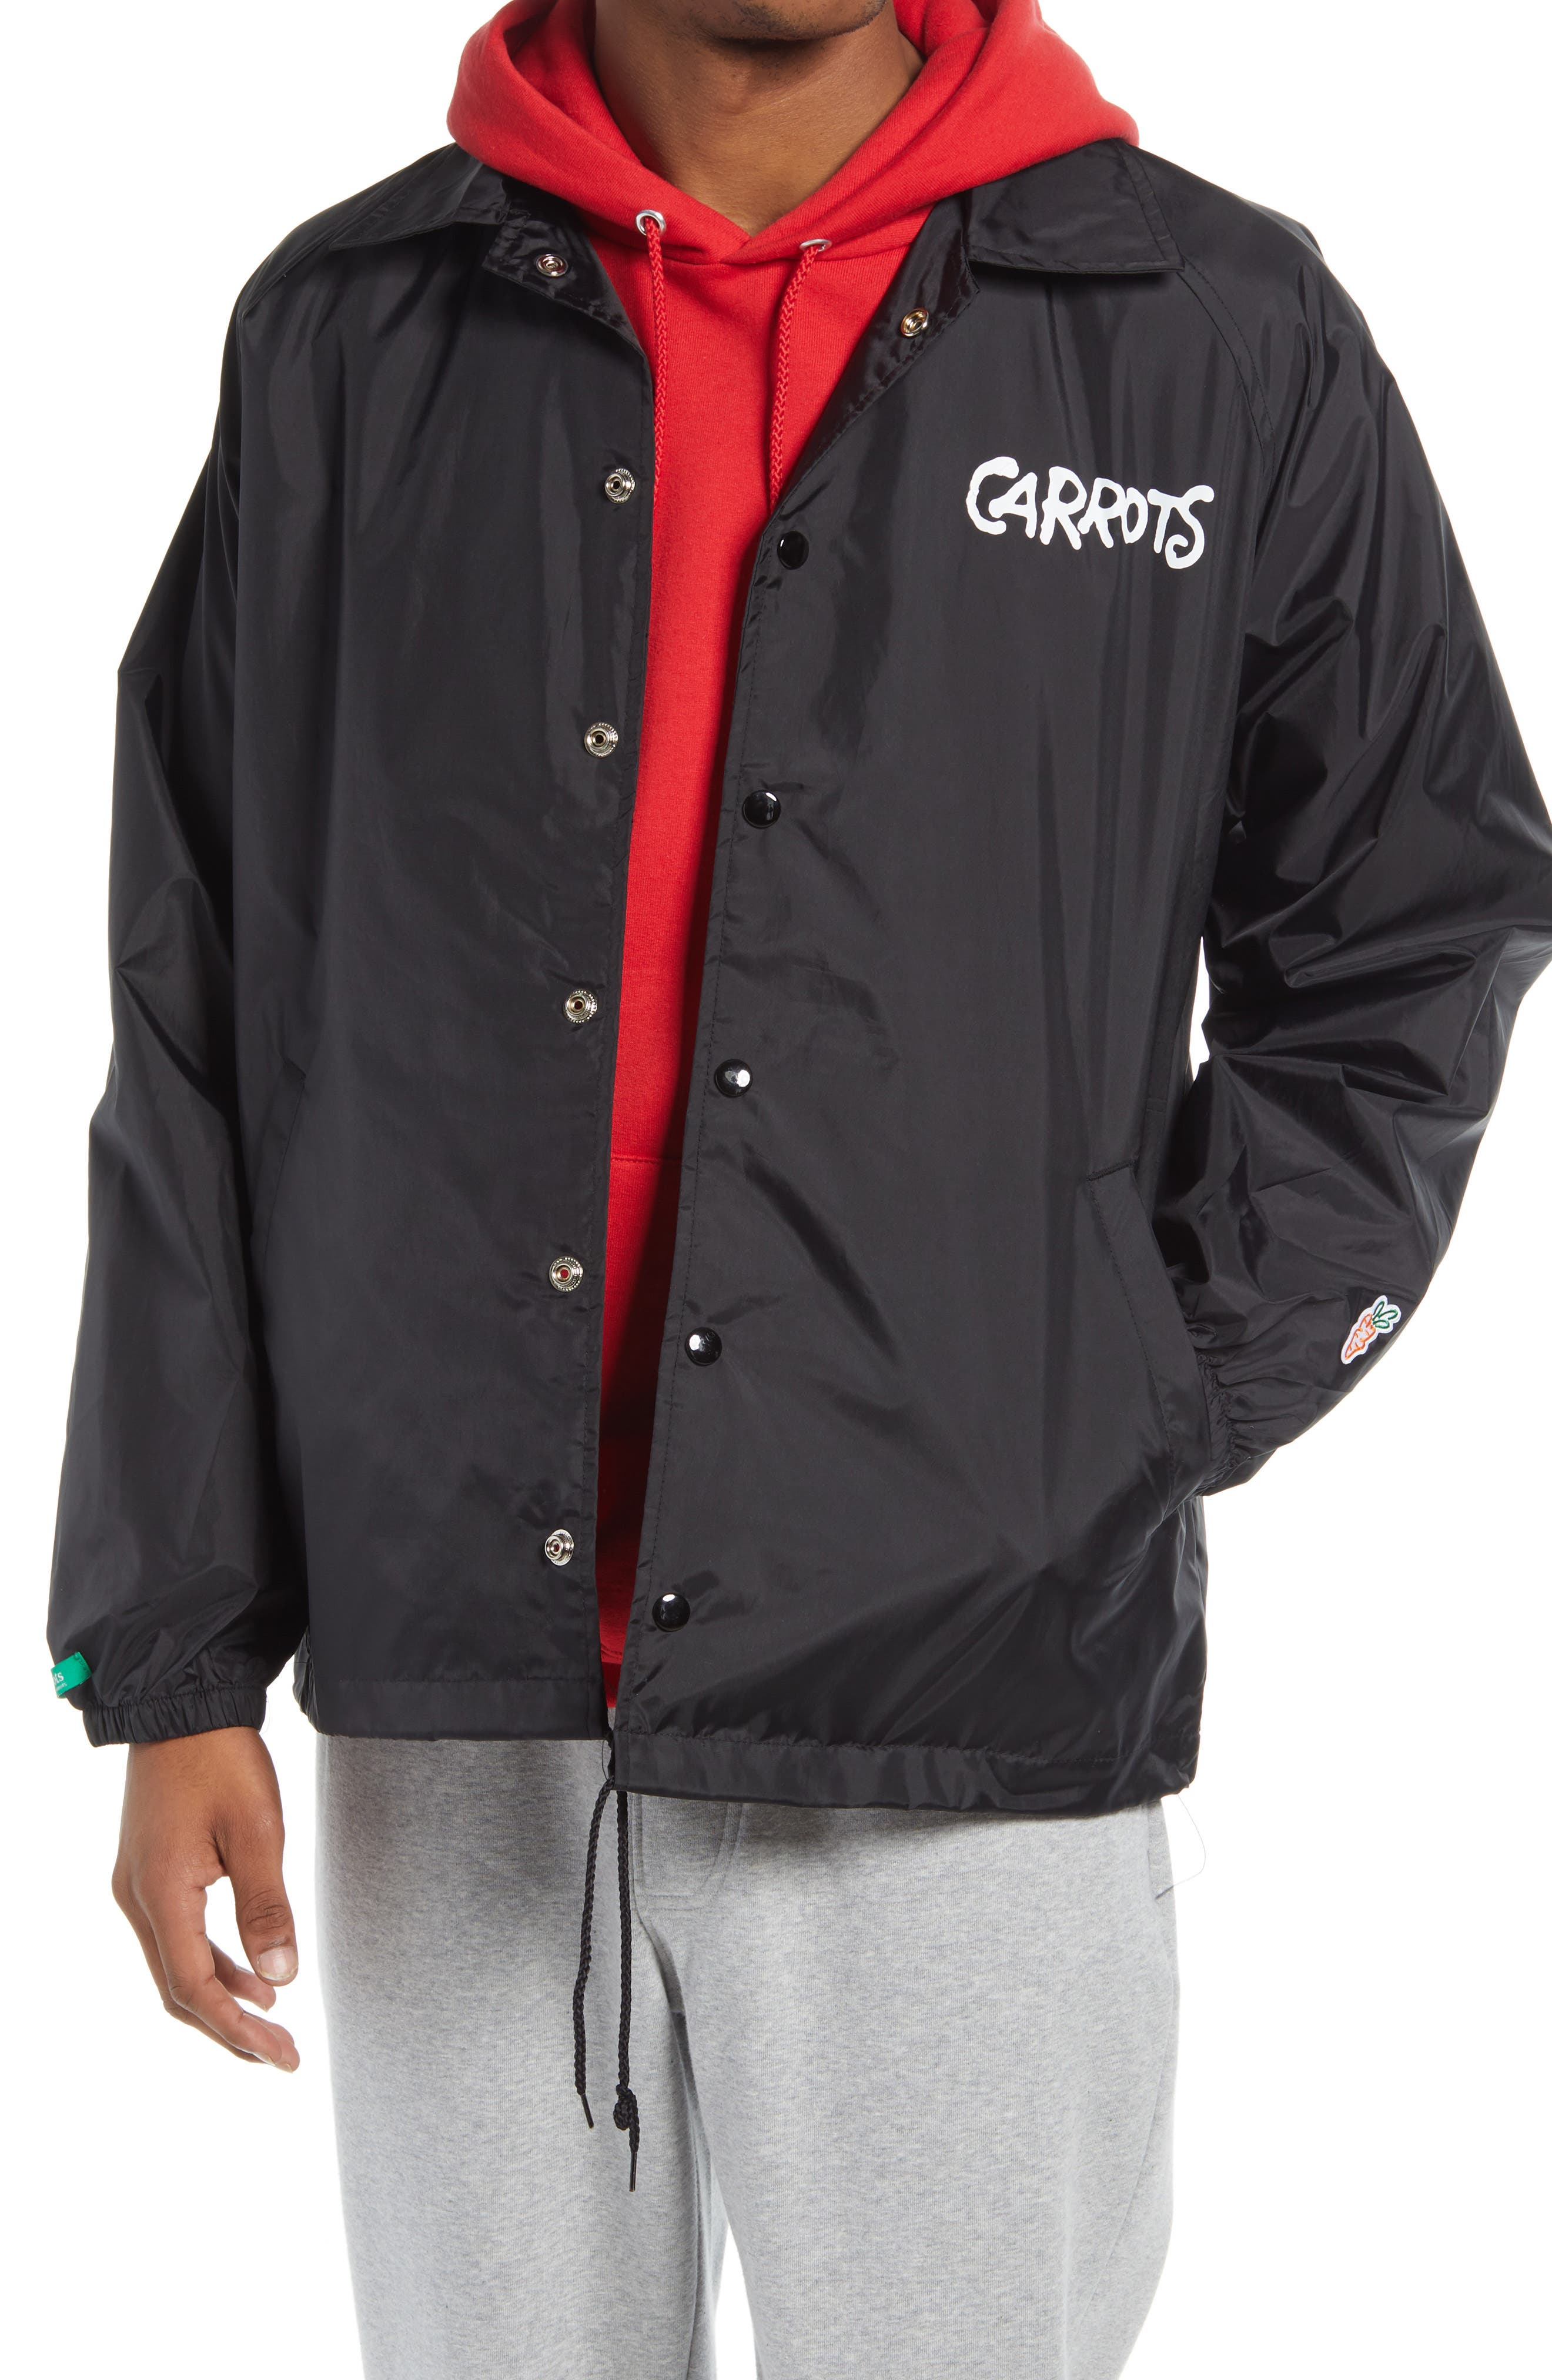 Warriors Coach's Jacket